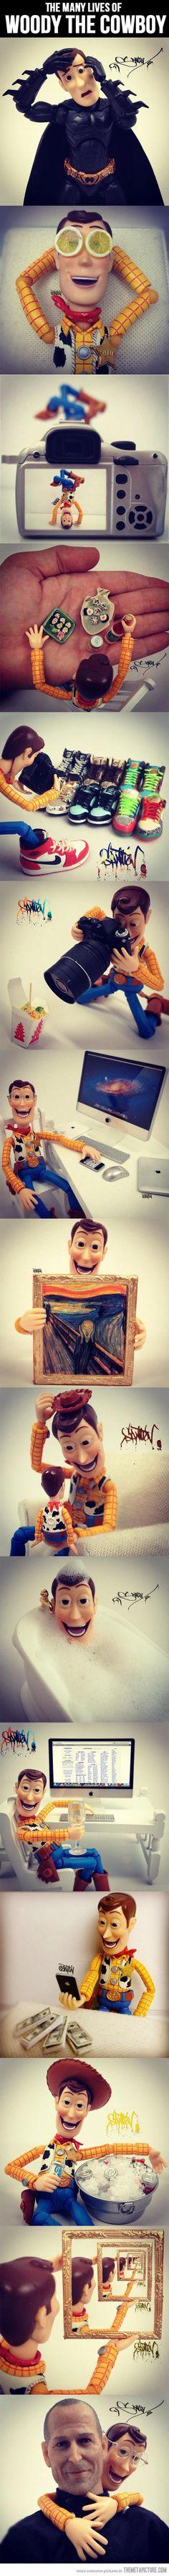 Woody's Secret Life